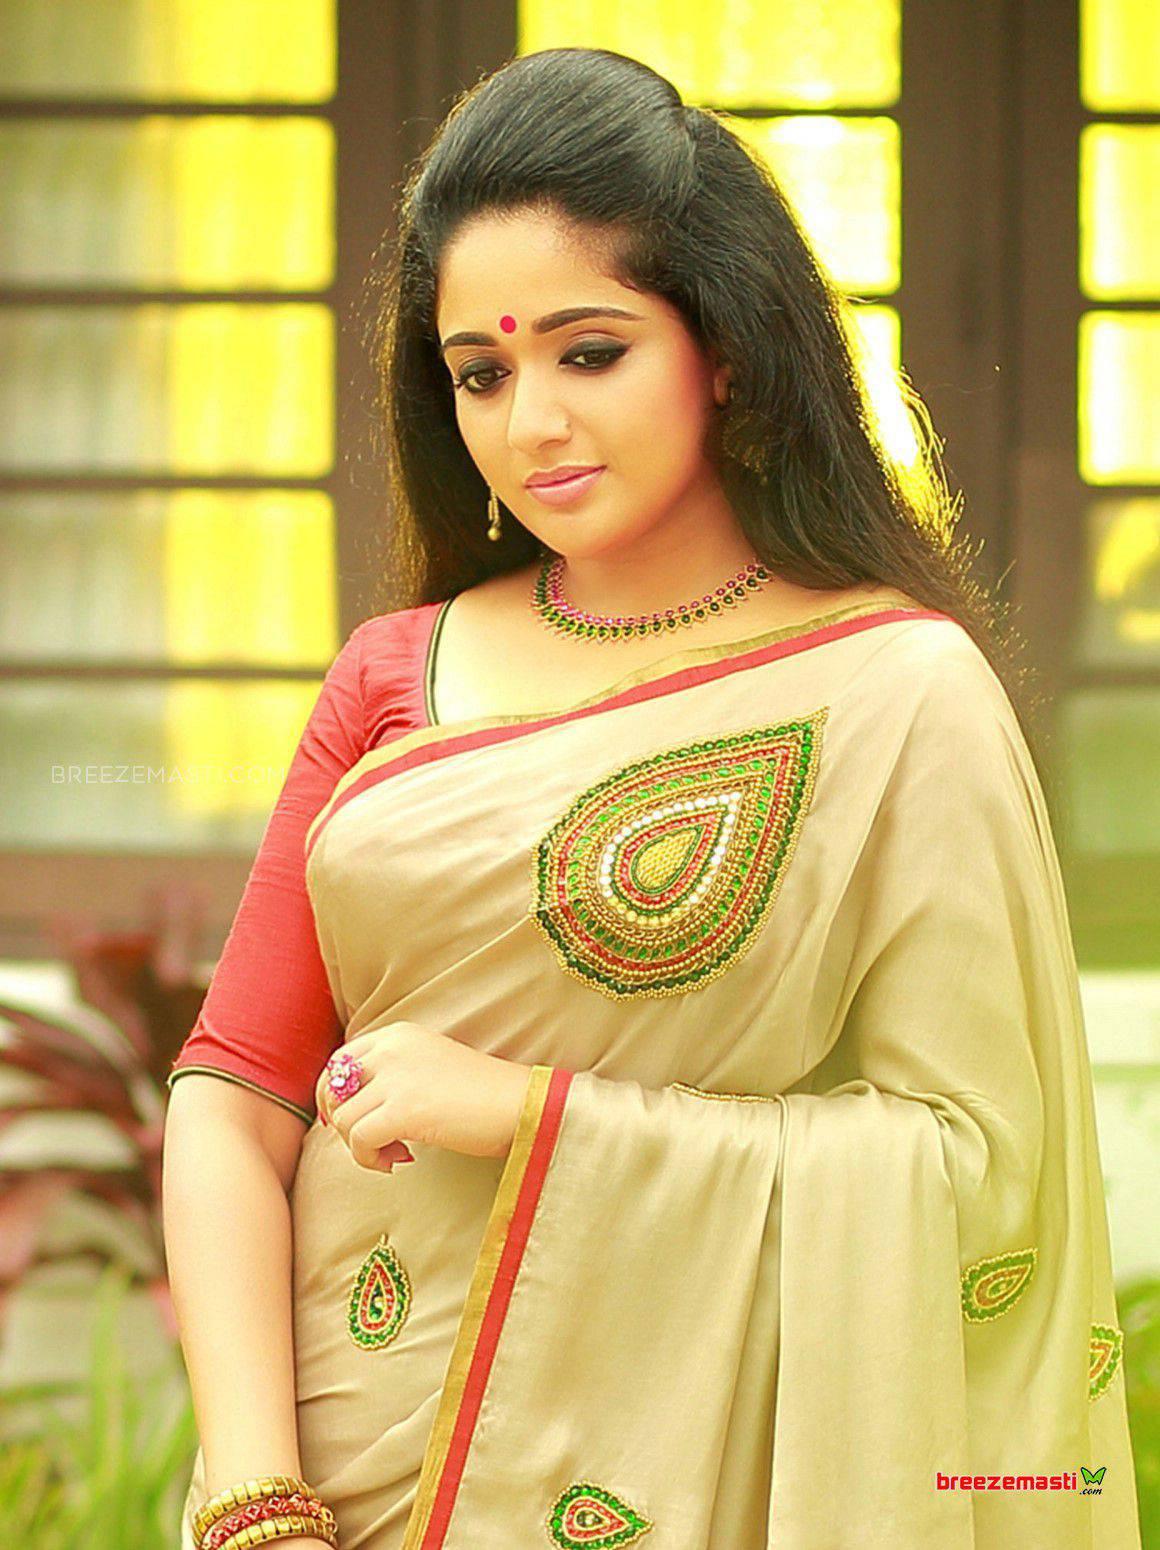 Malayalam Actress Kavya Madhavan profile pictures